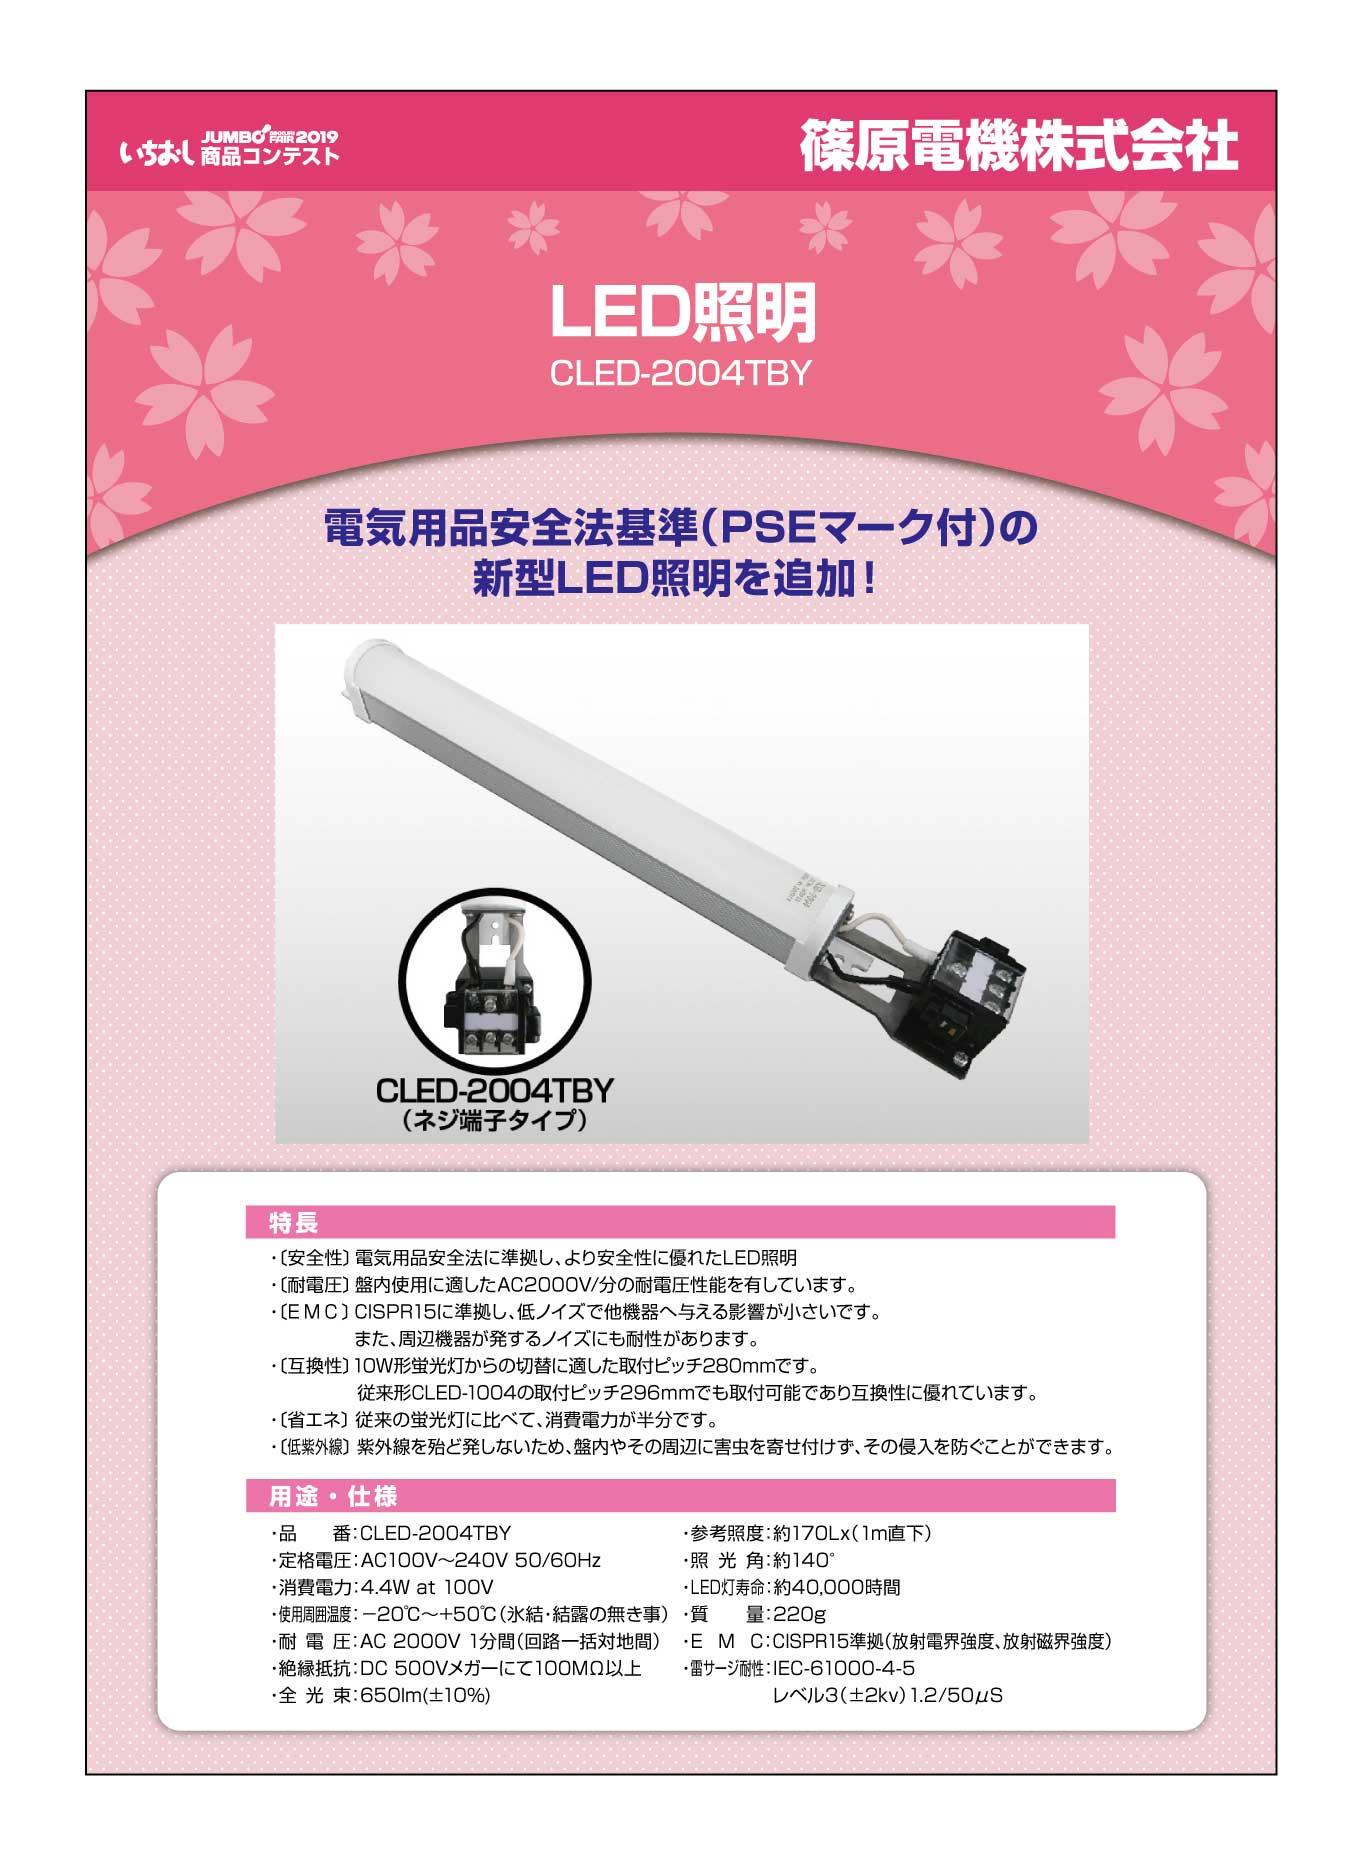 「LED照明」篠原電機株式会社の画像